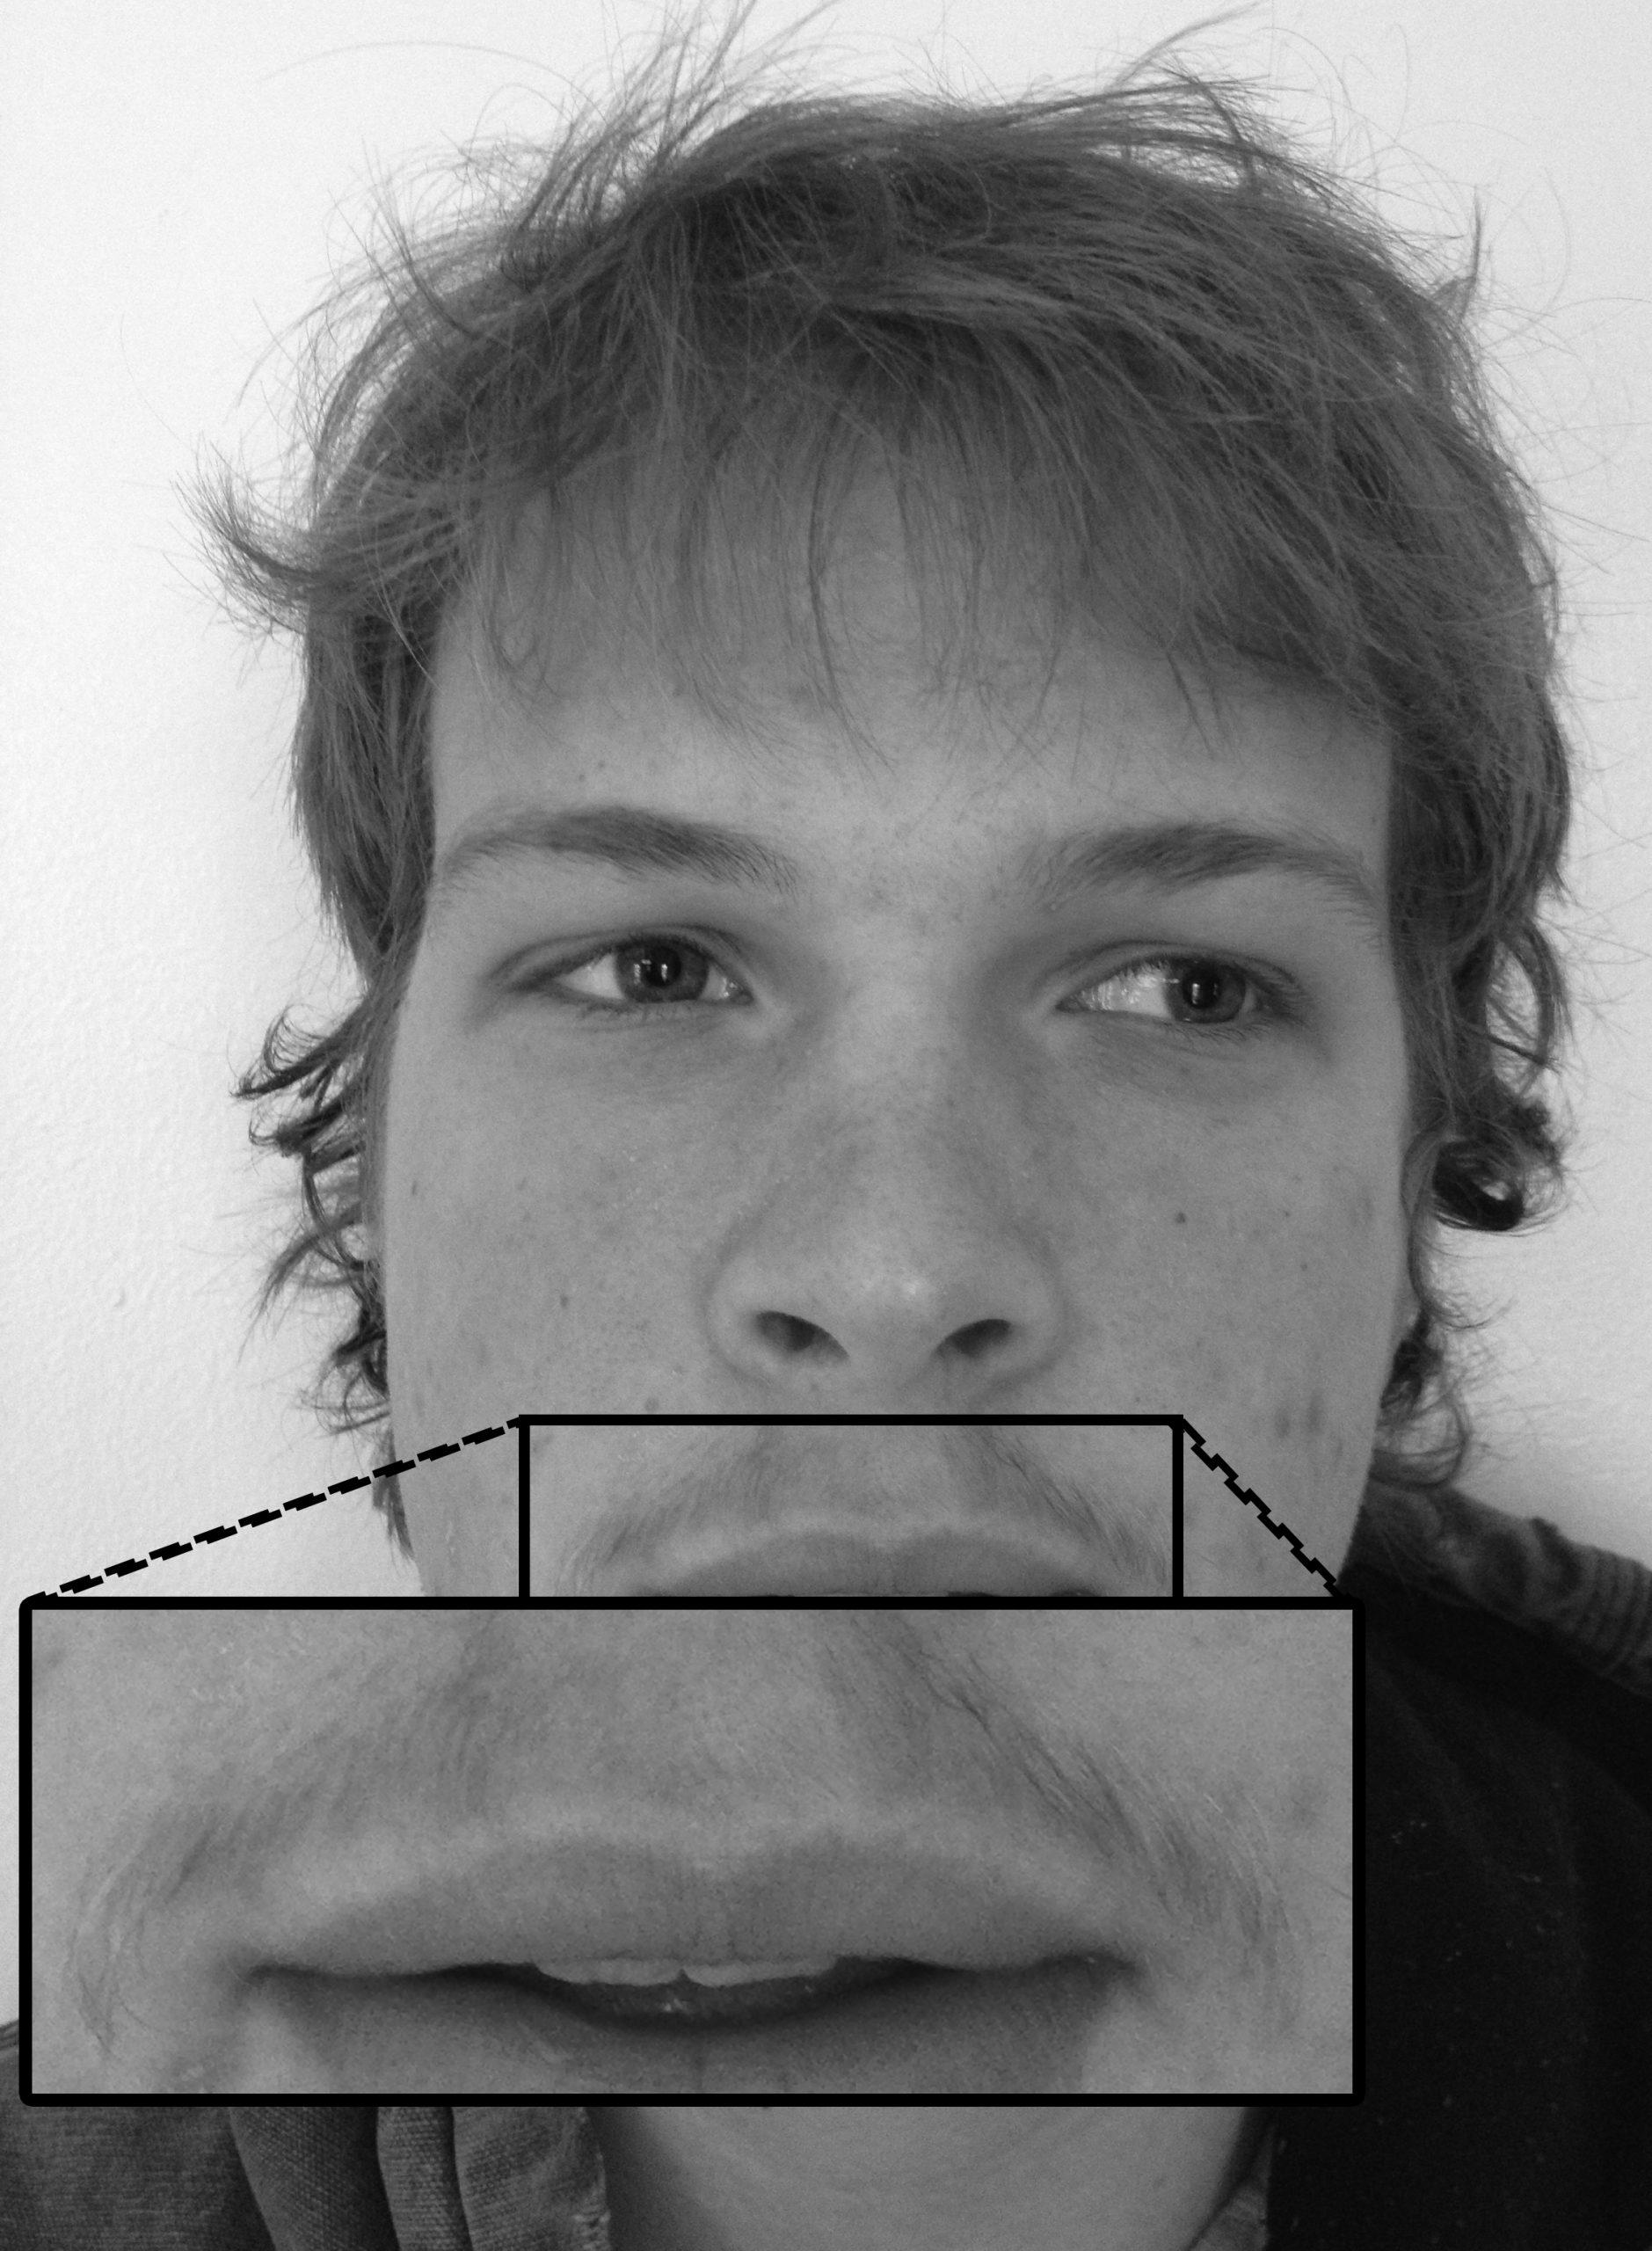 Close up mustache picture